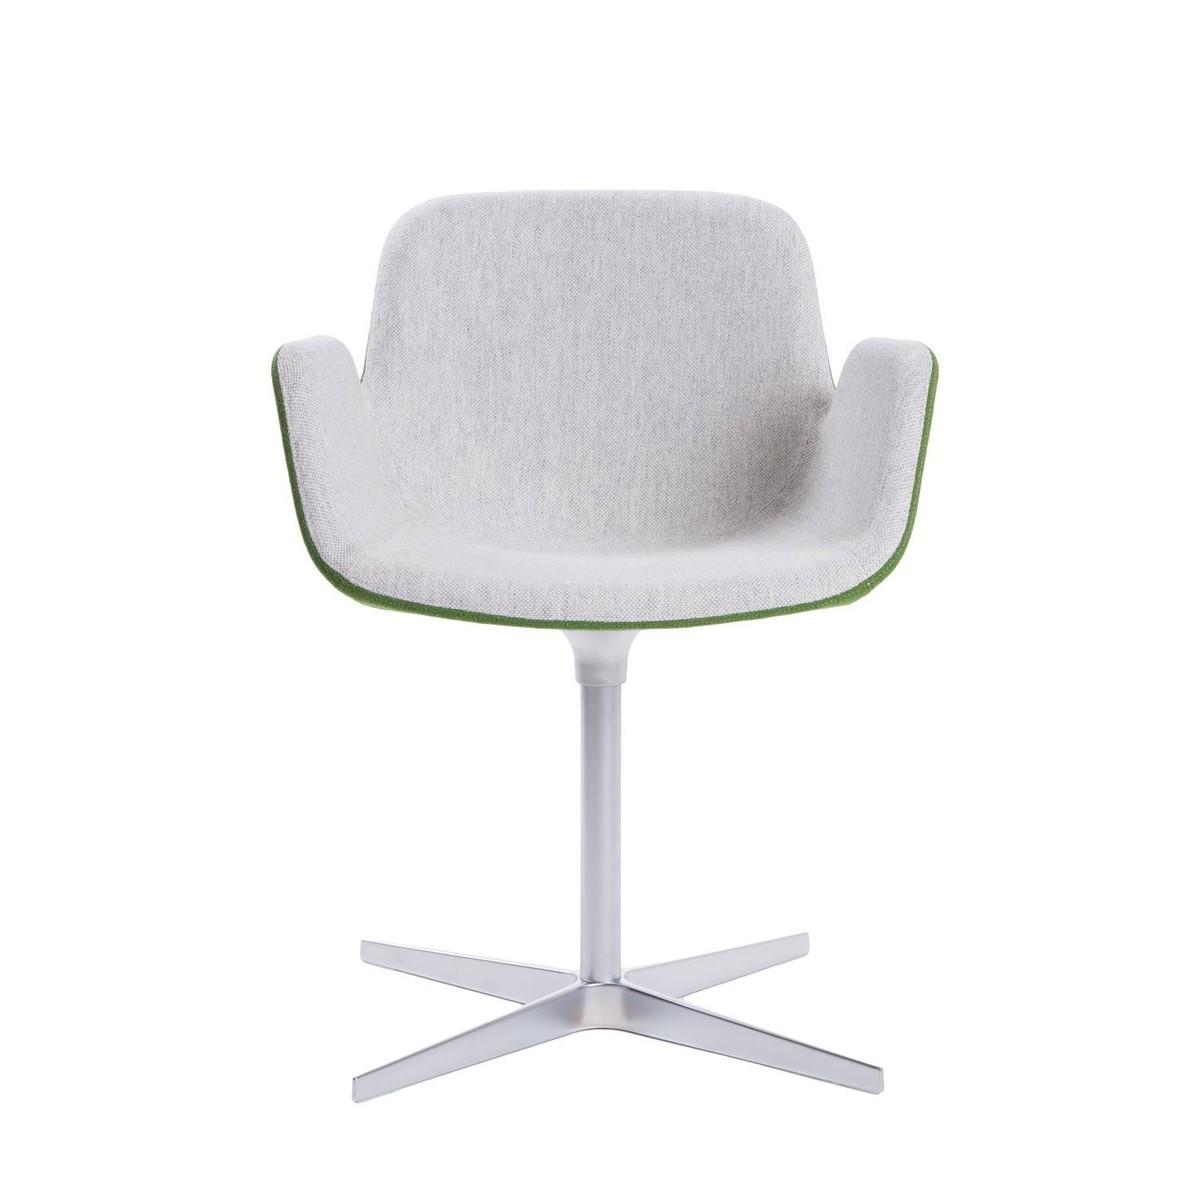 Pass chaise pivotante avec accoudoirs la palma for Chaise pivotante